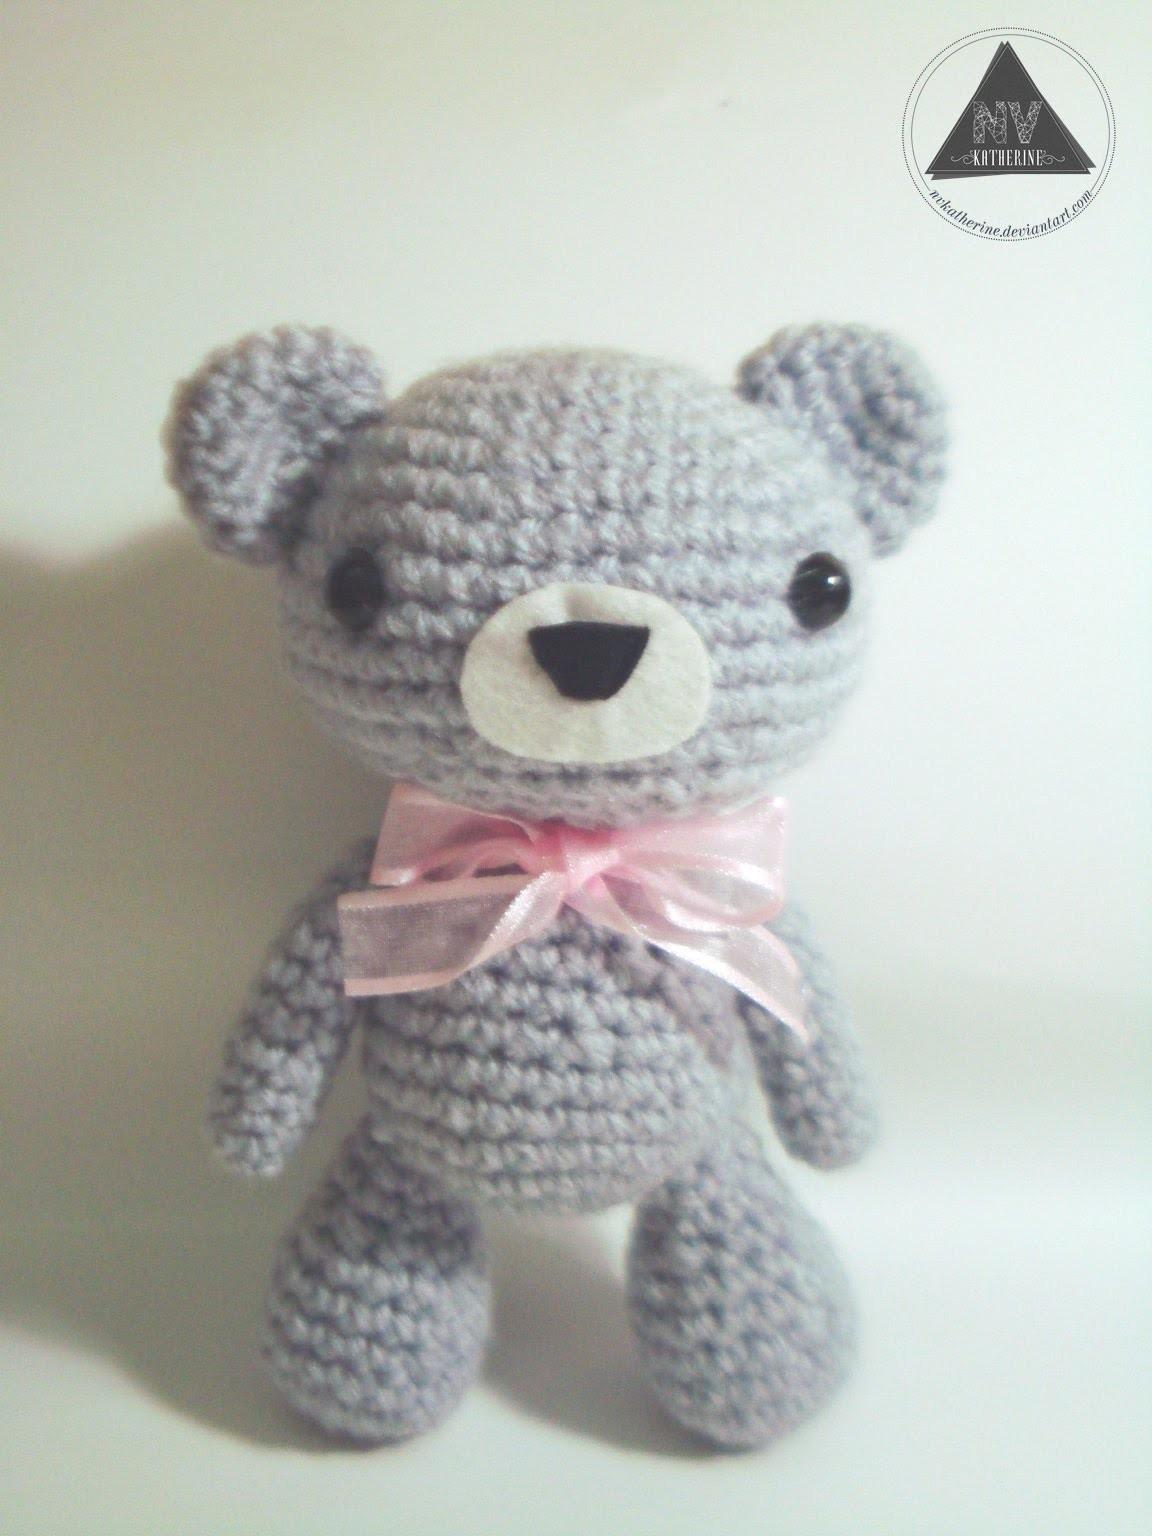 How to crochet a kawaii bear amigurumi tutorial [Part 2.2]